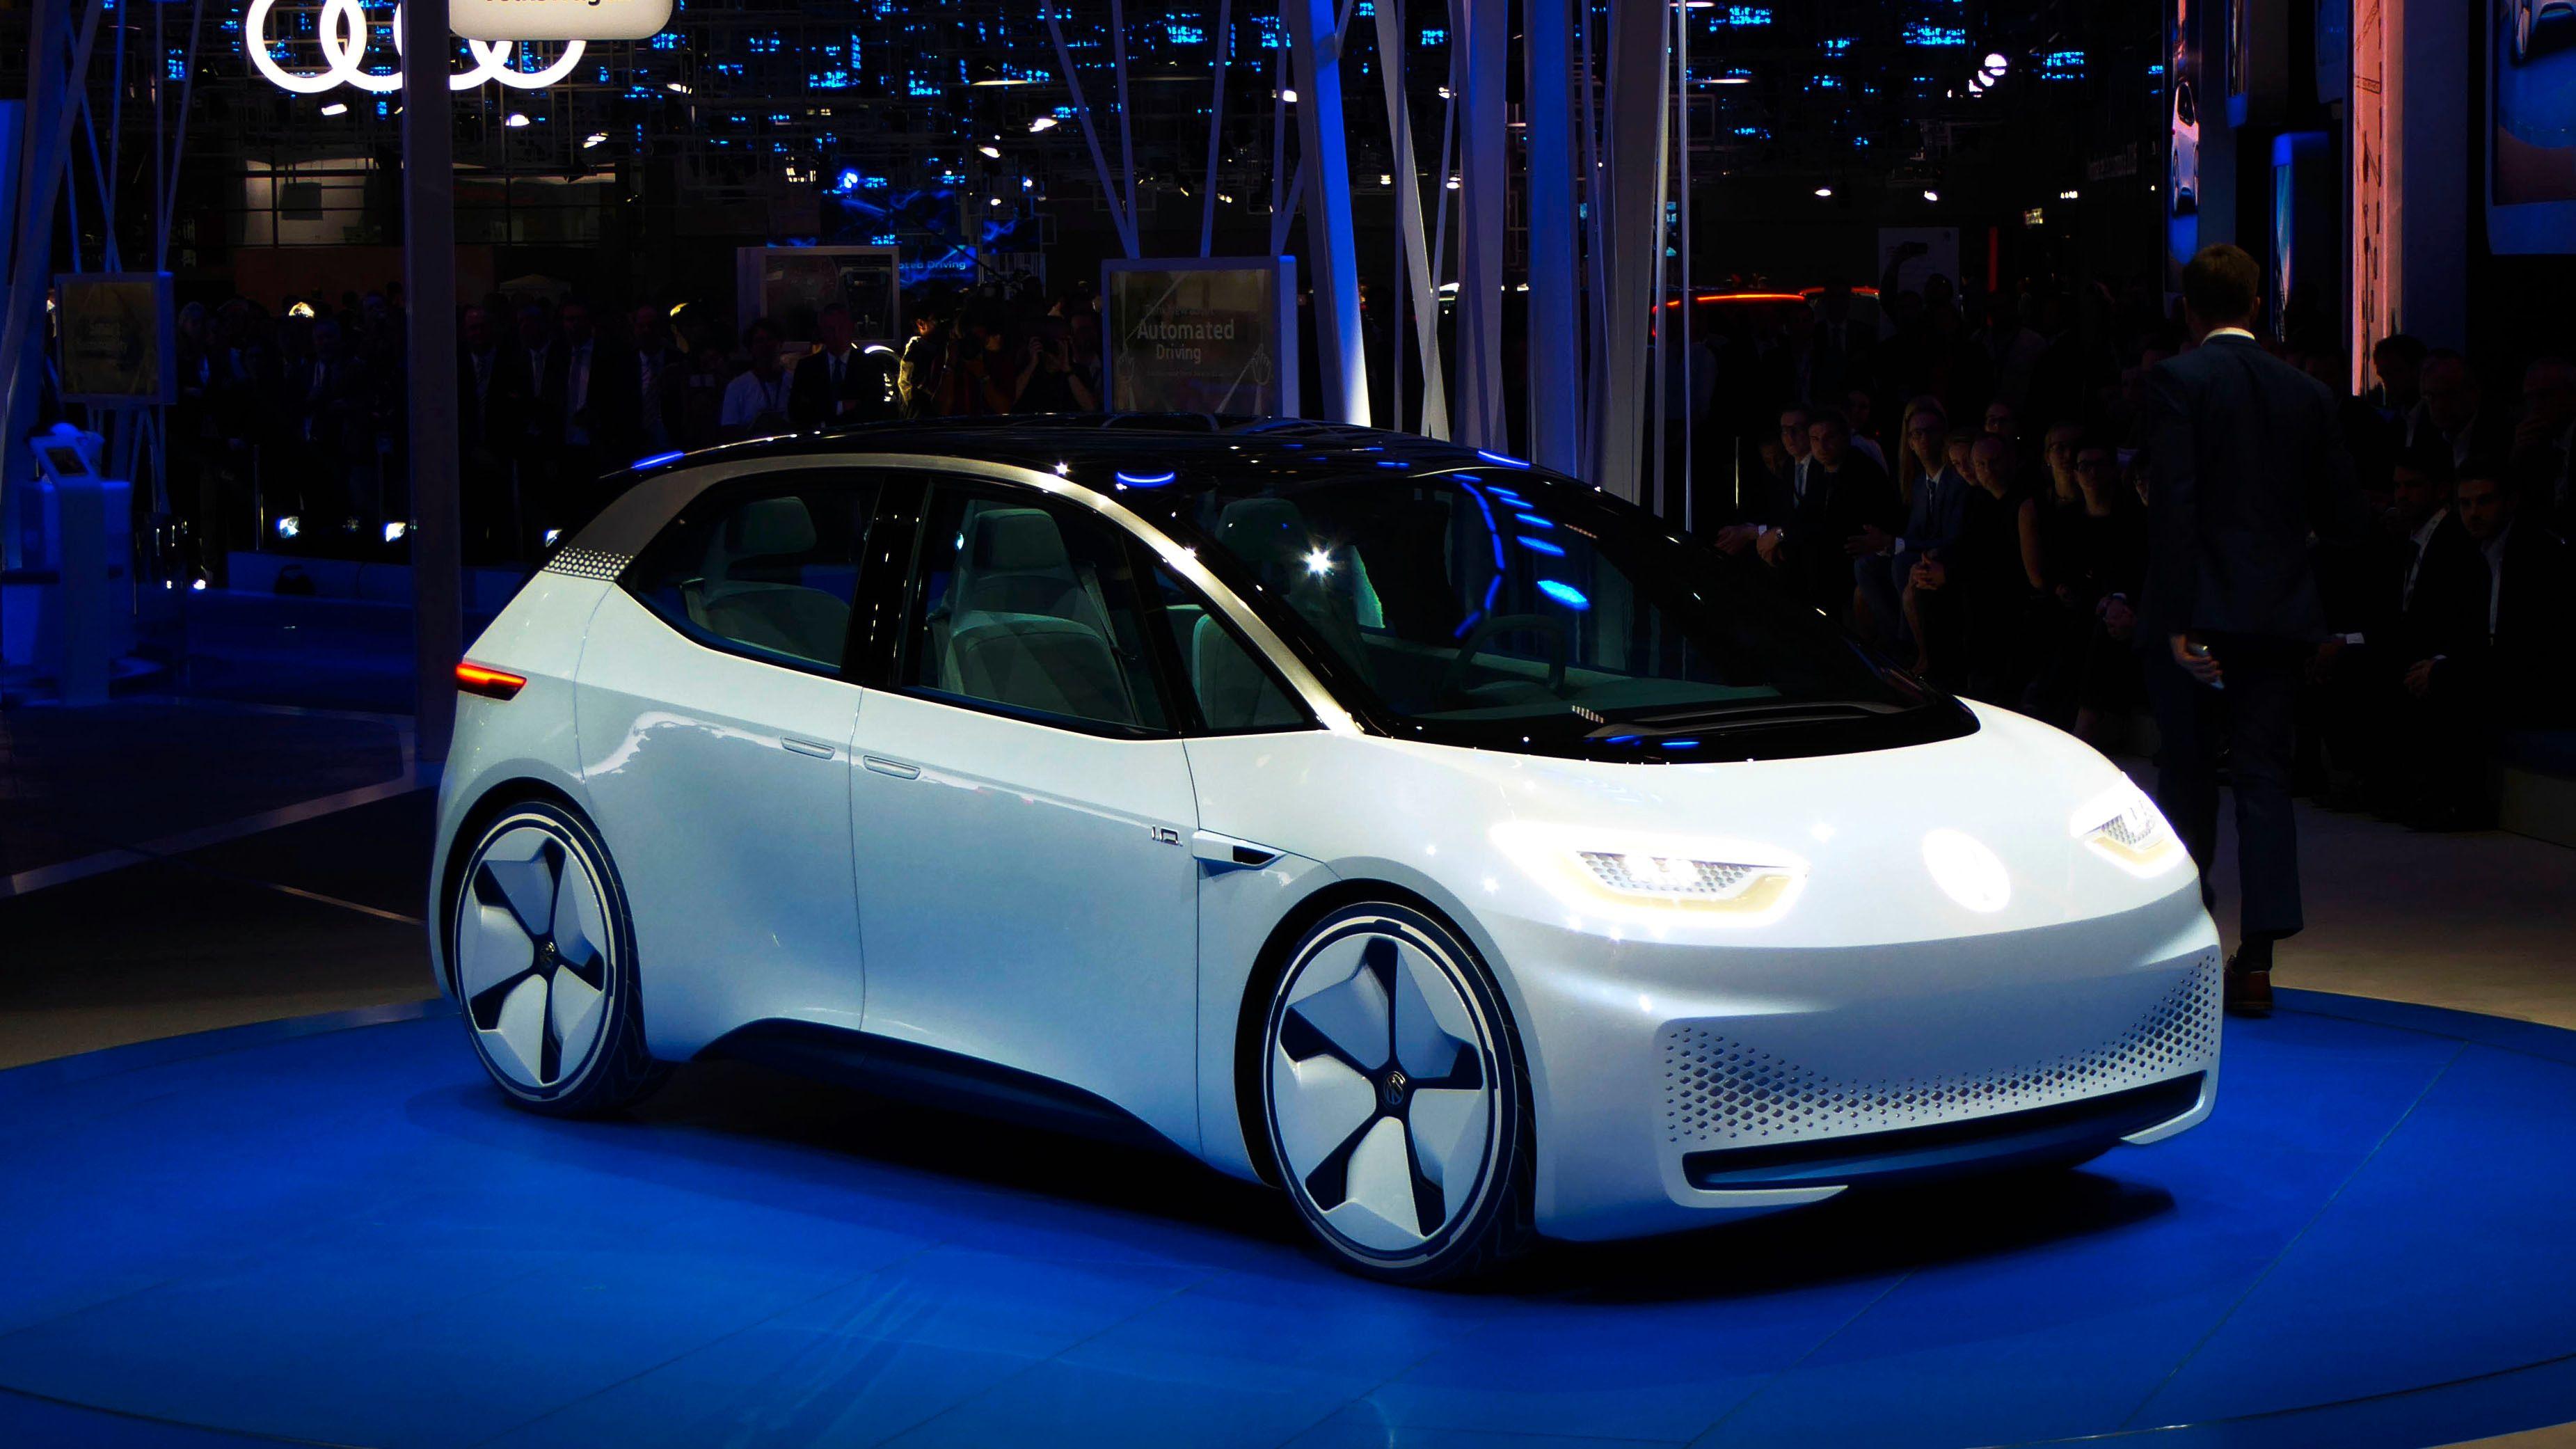 Spår en startpris for Volkswagens nye elbil på godt under 300 000 kroner